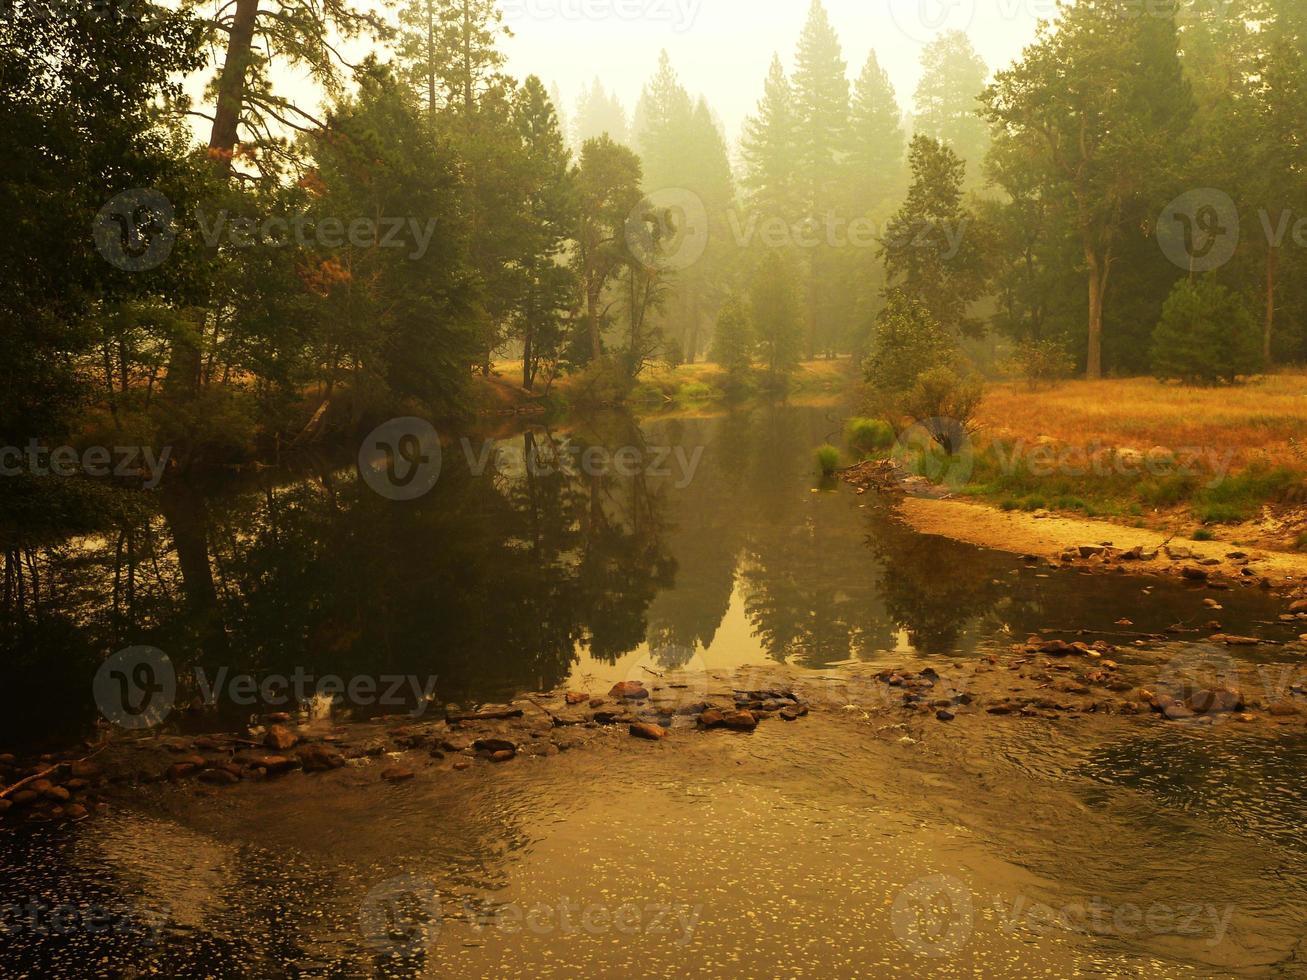 Yosemite river photo